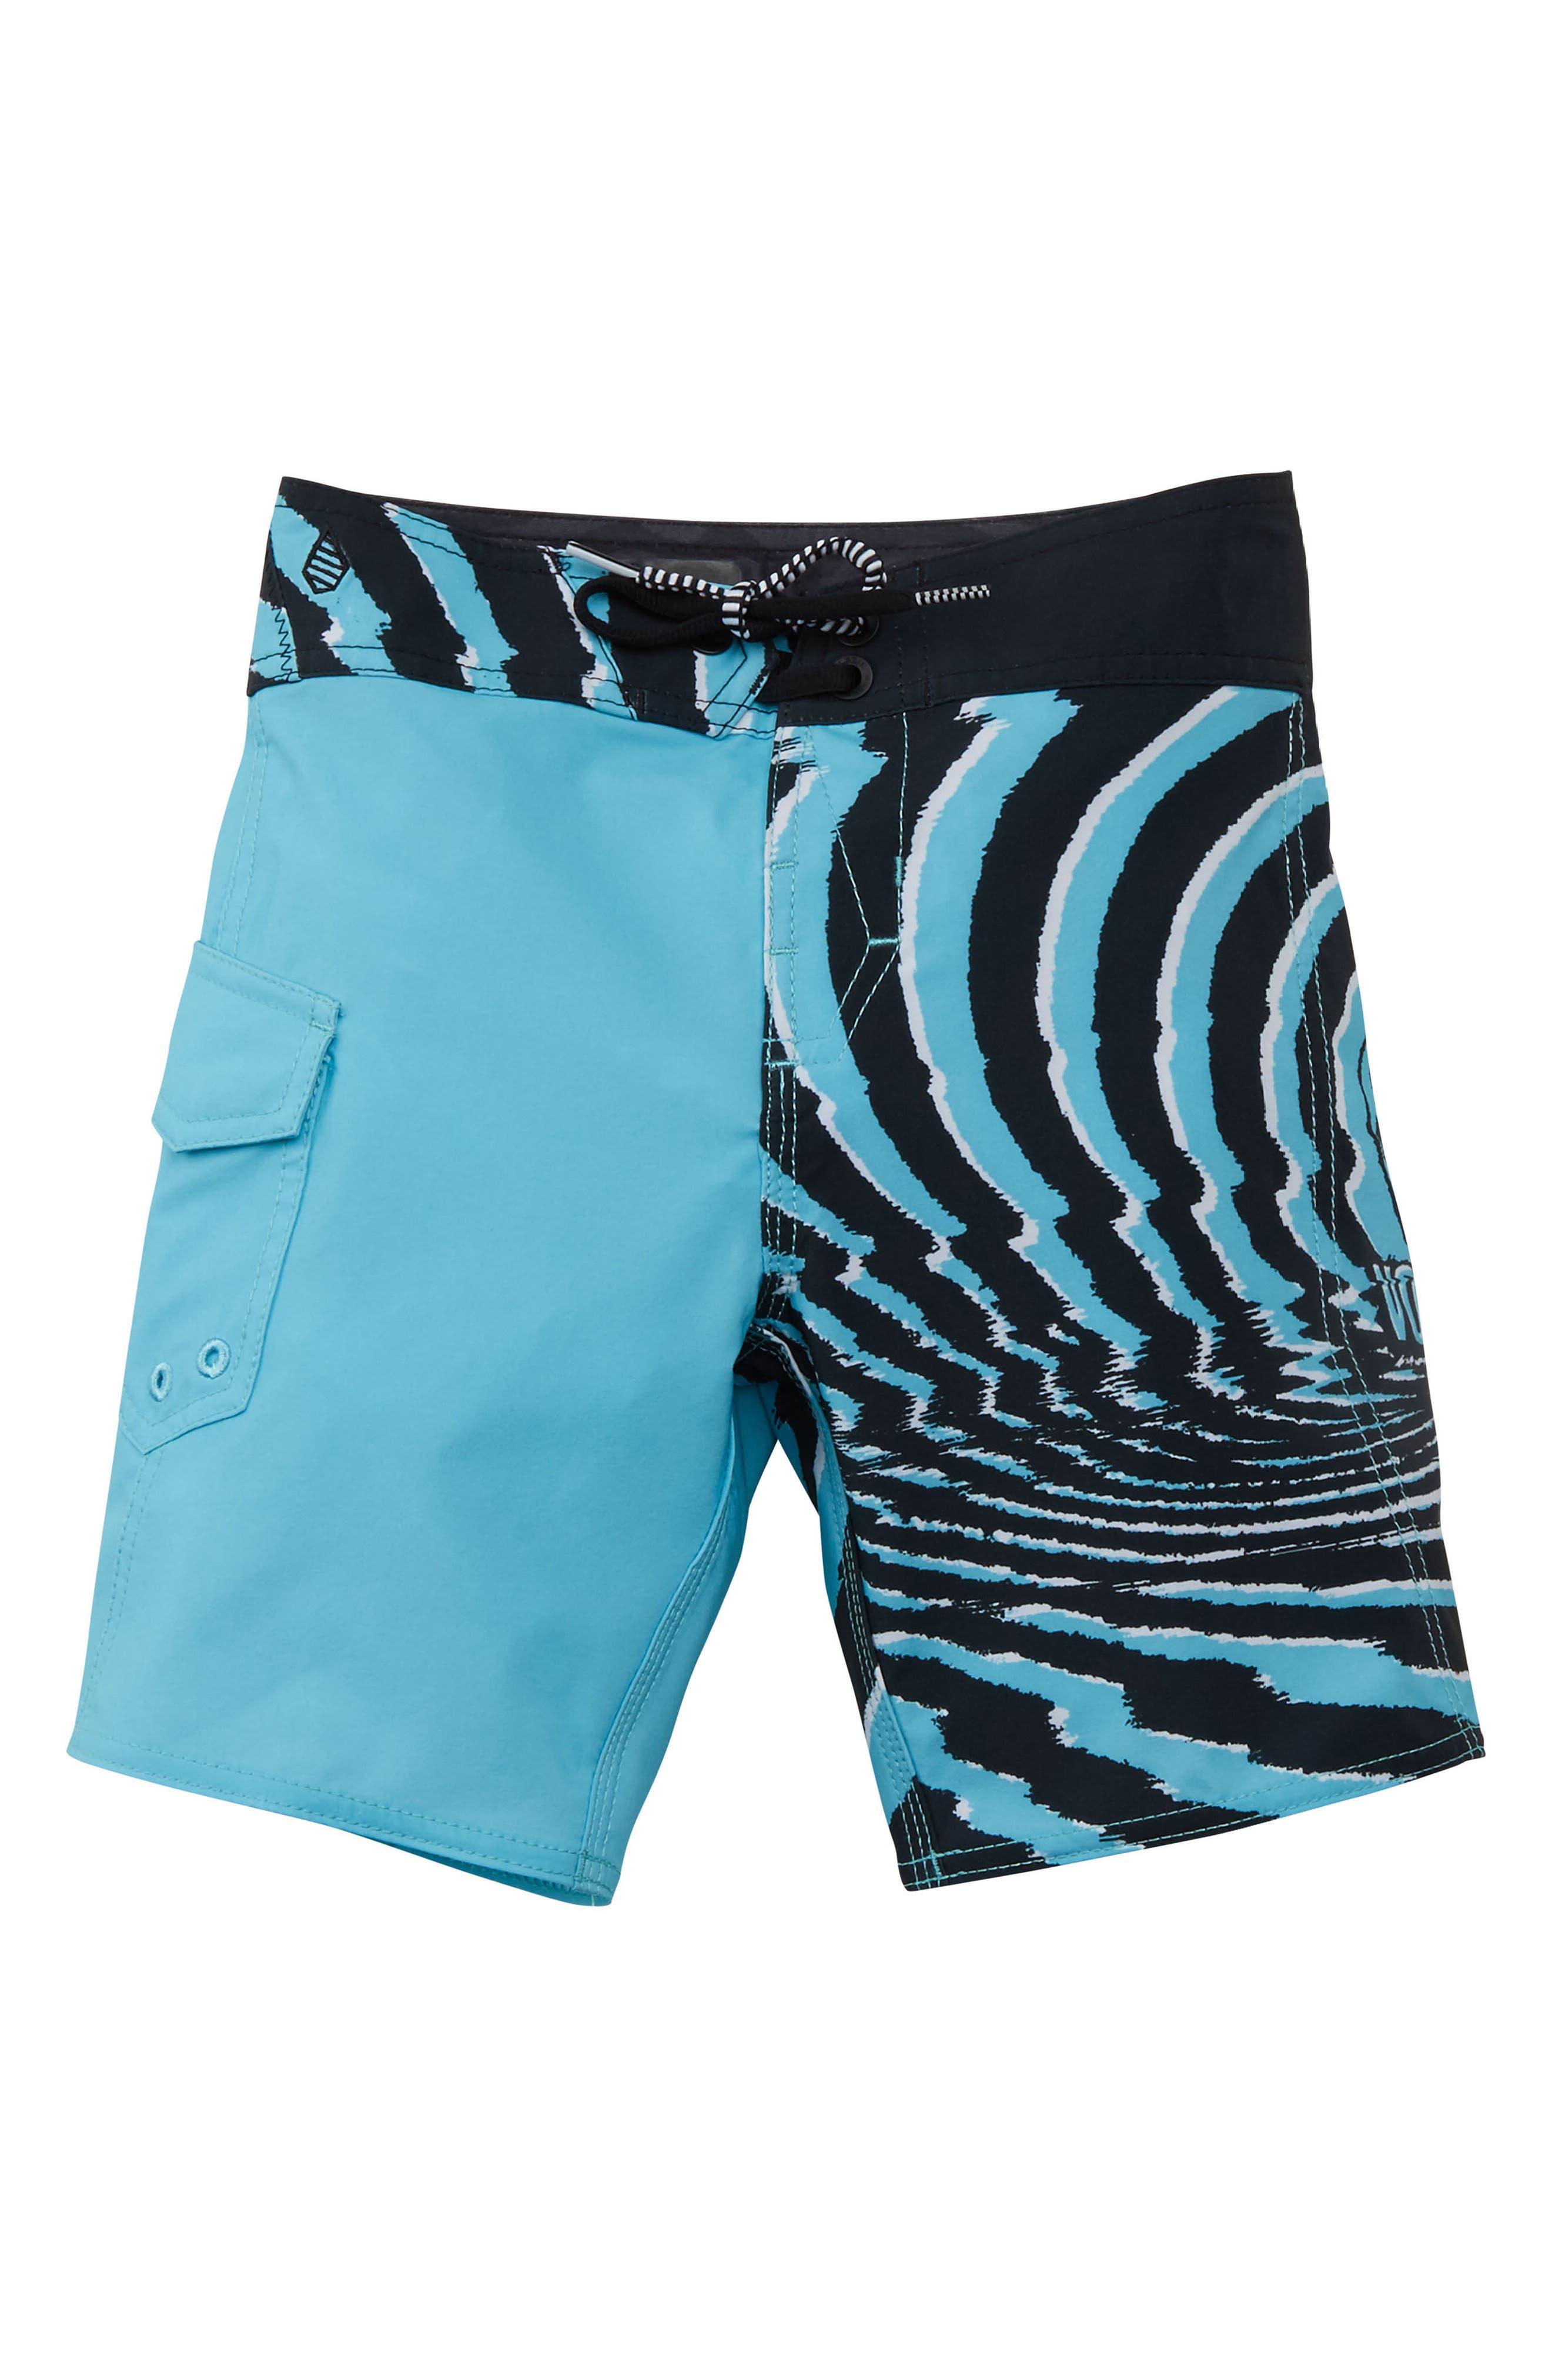 Lido Block Mod Board Shorts,                             Main thumbnail 1, color,                             470